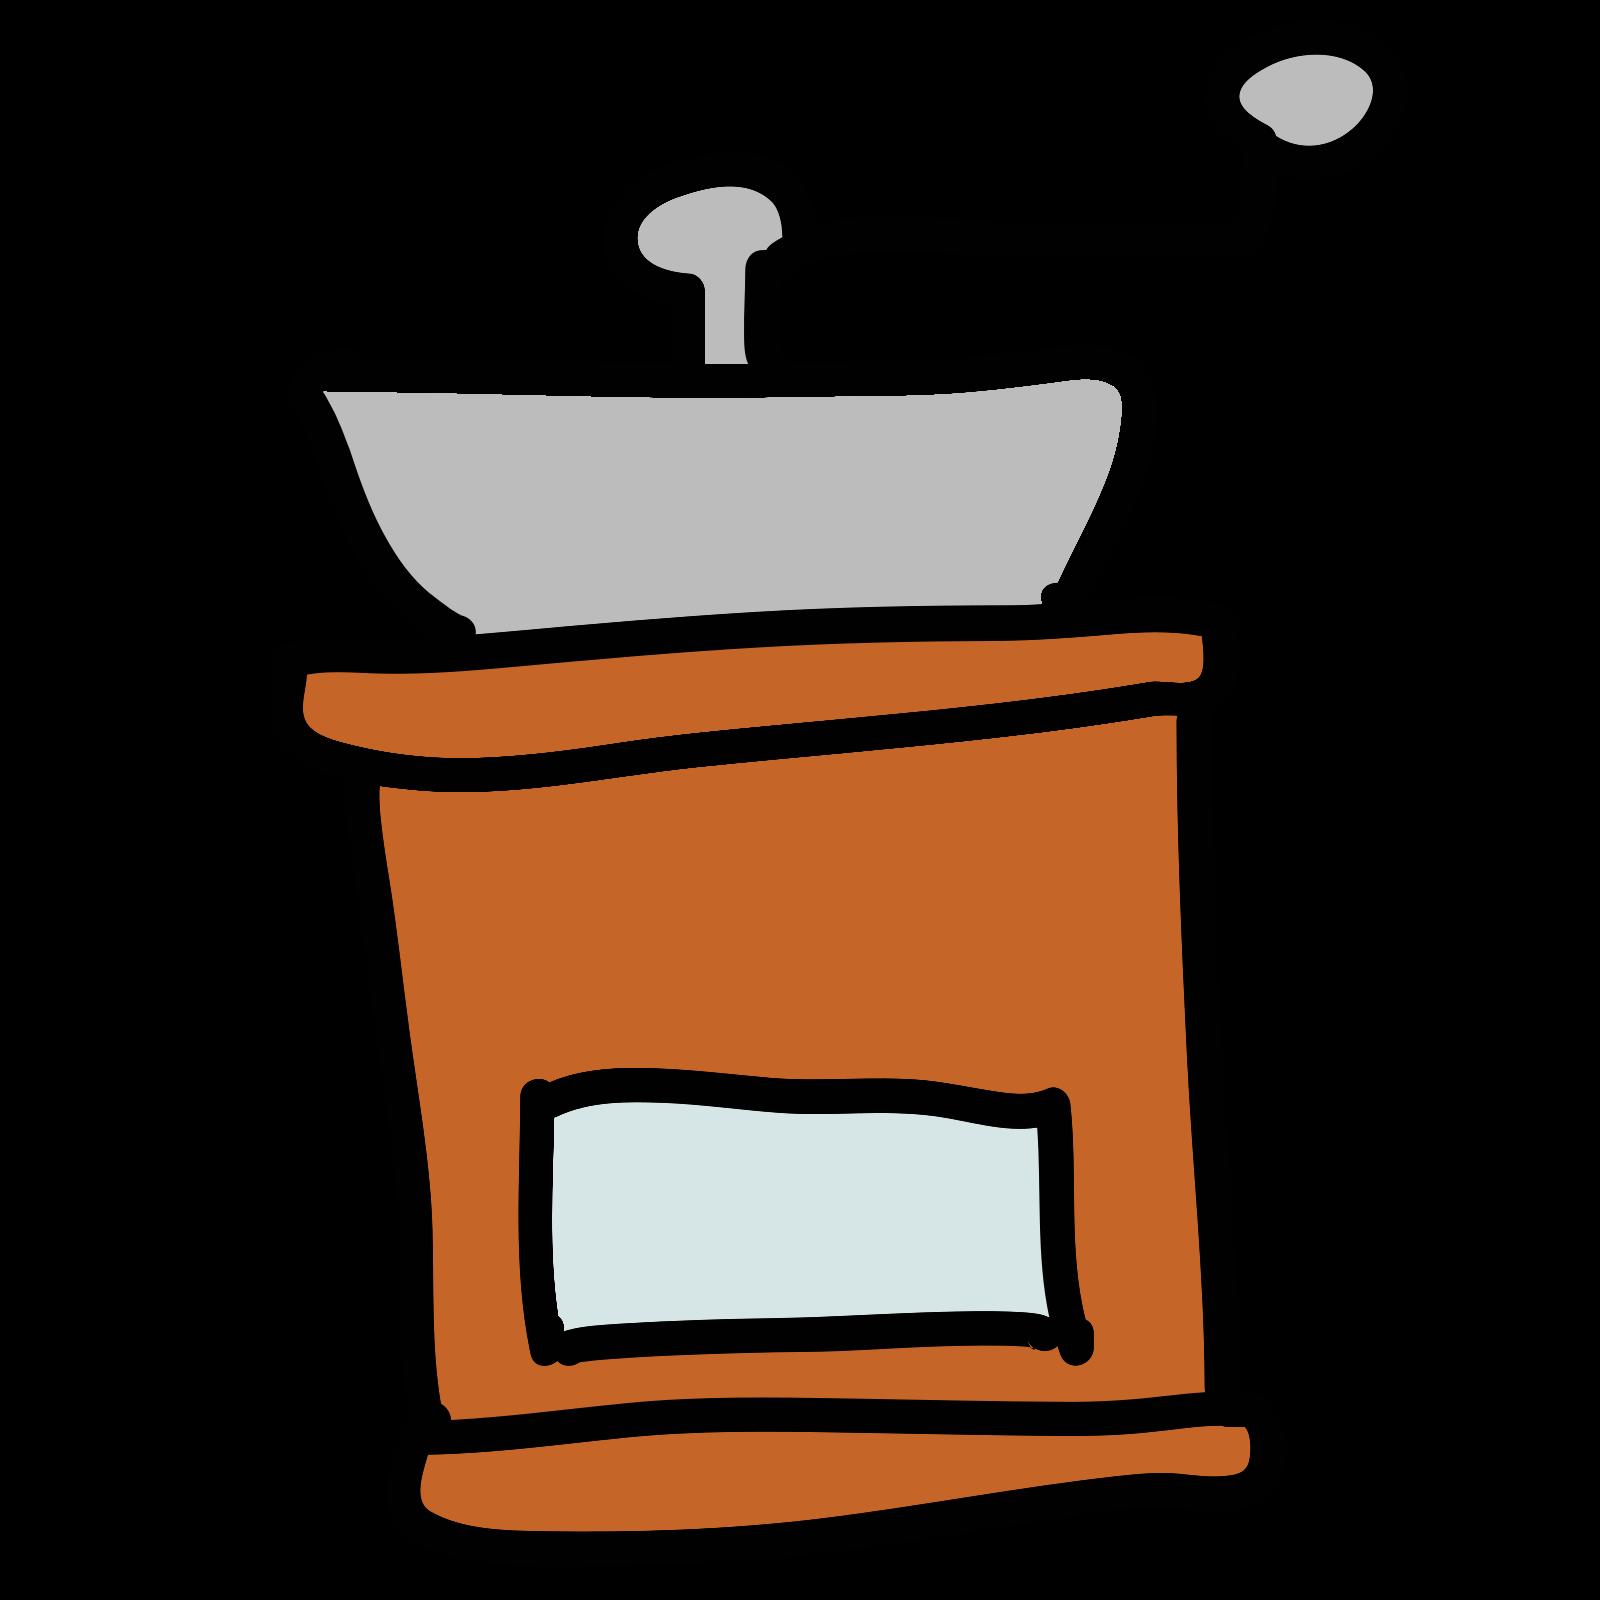 Pepper grinder icon